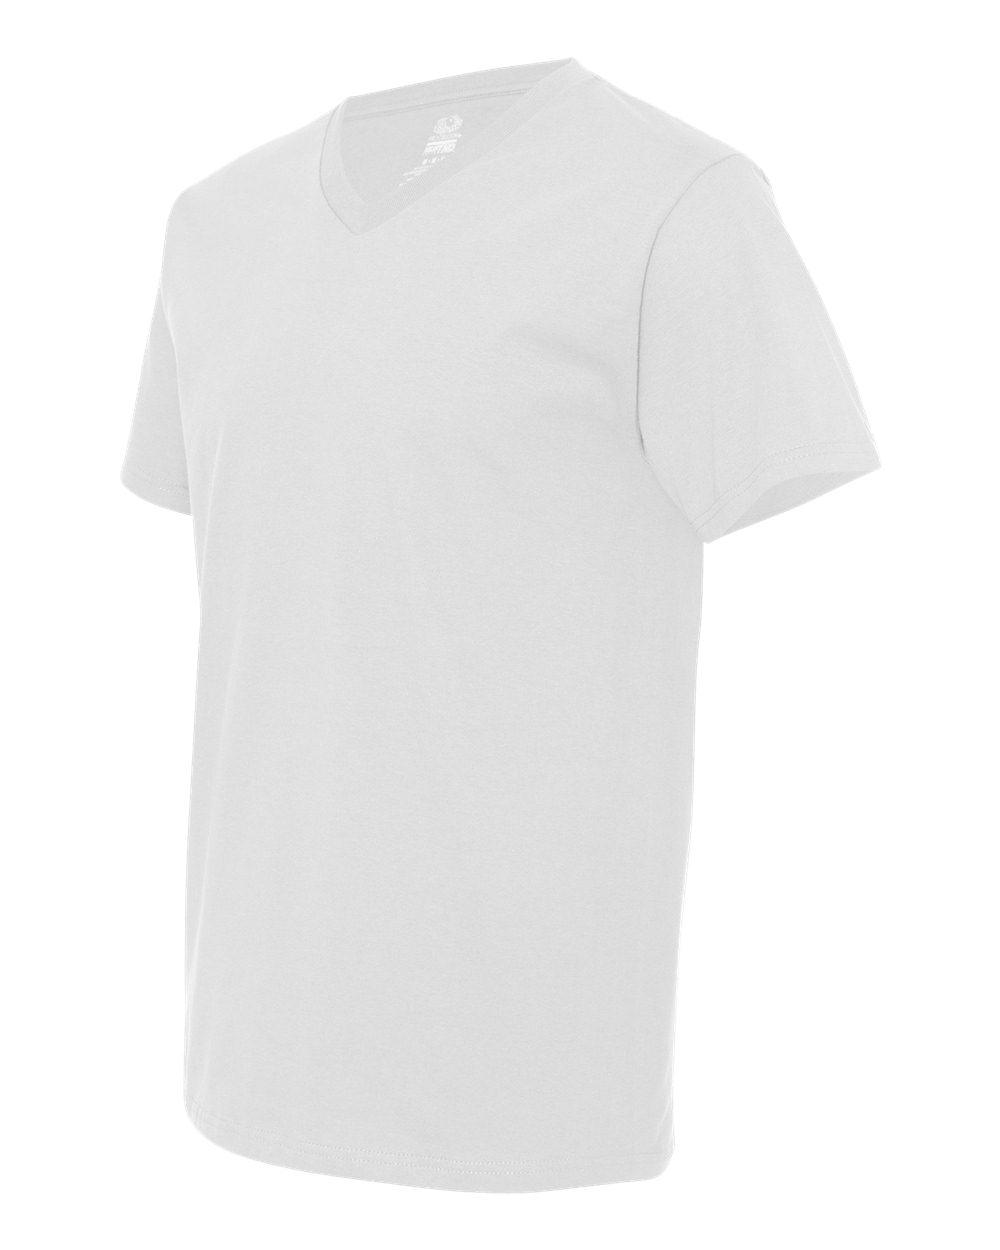 Fruit of the Loom Men/'s 5 oz 100/% Heavy Cotton HD V-Neck T-Shirt 39VR S-3XL